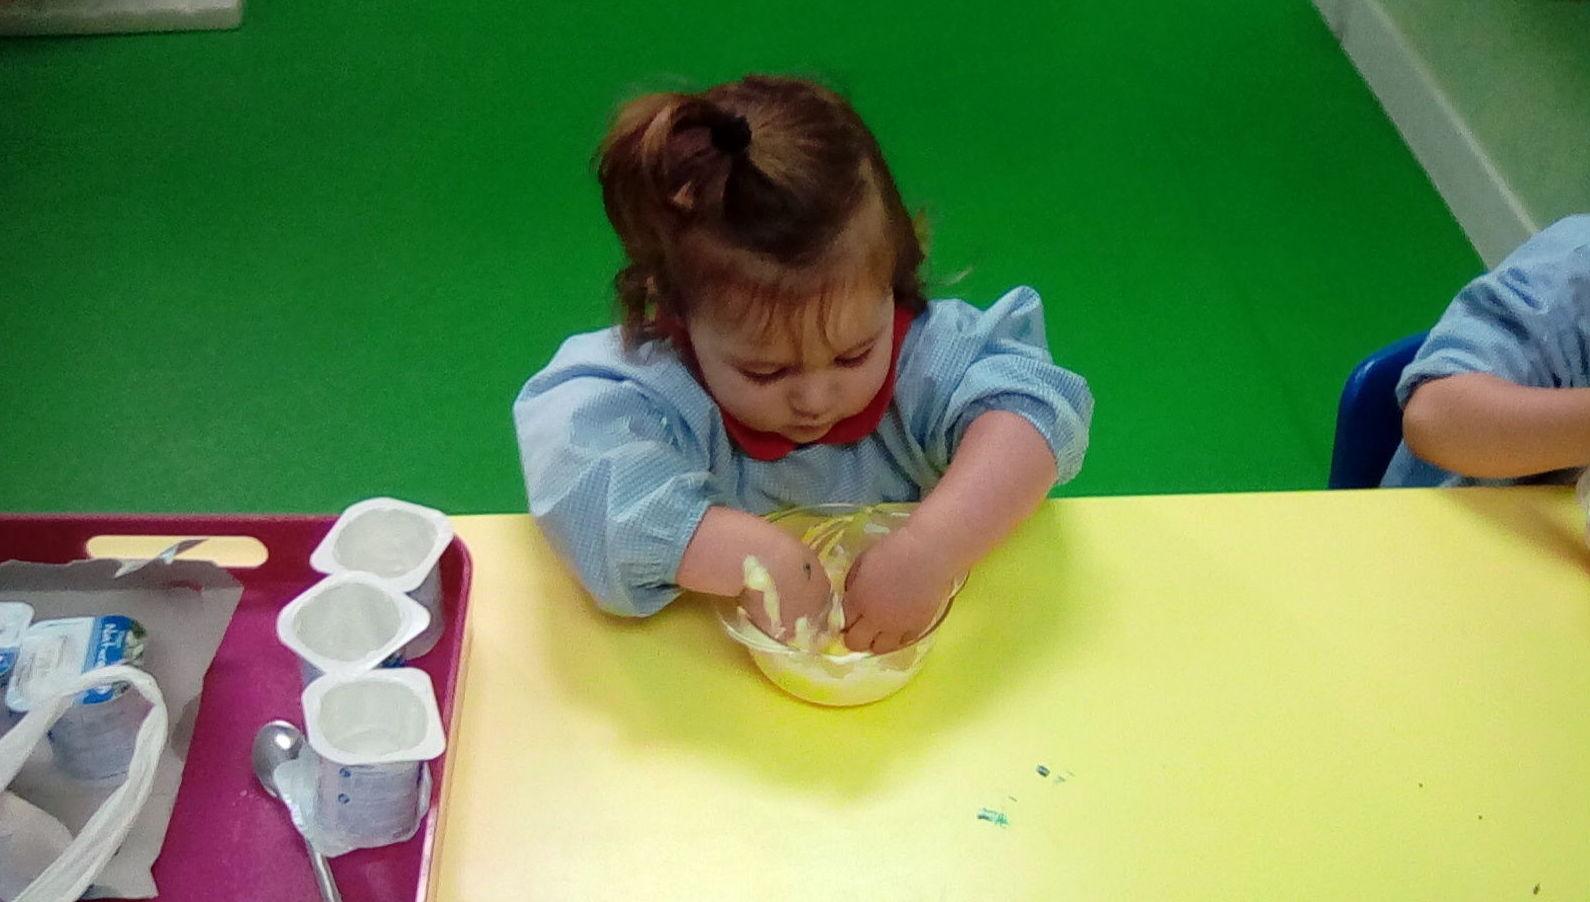 Foto 30 de Escuela infantil en Algete | E.I. Cuatro Pecas de Colores